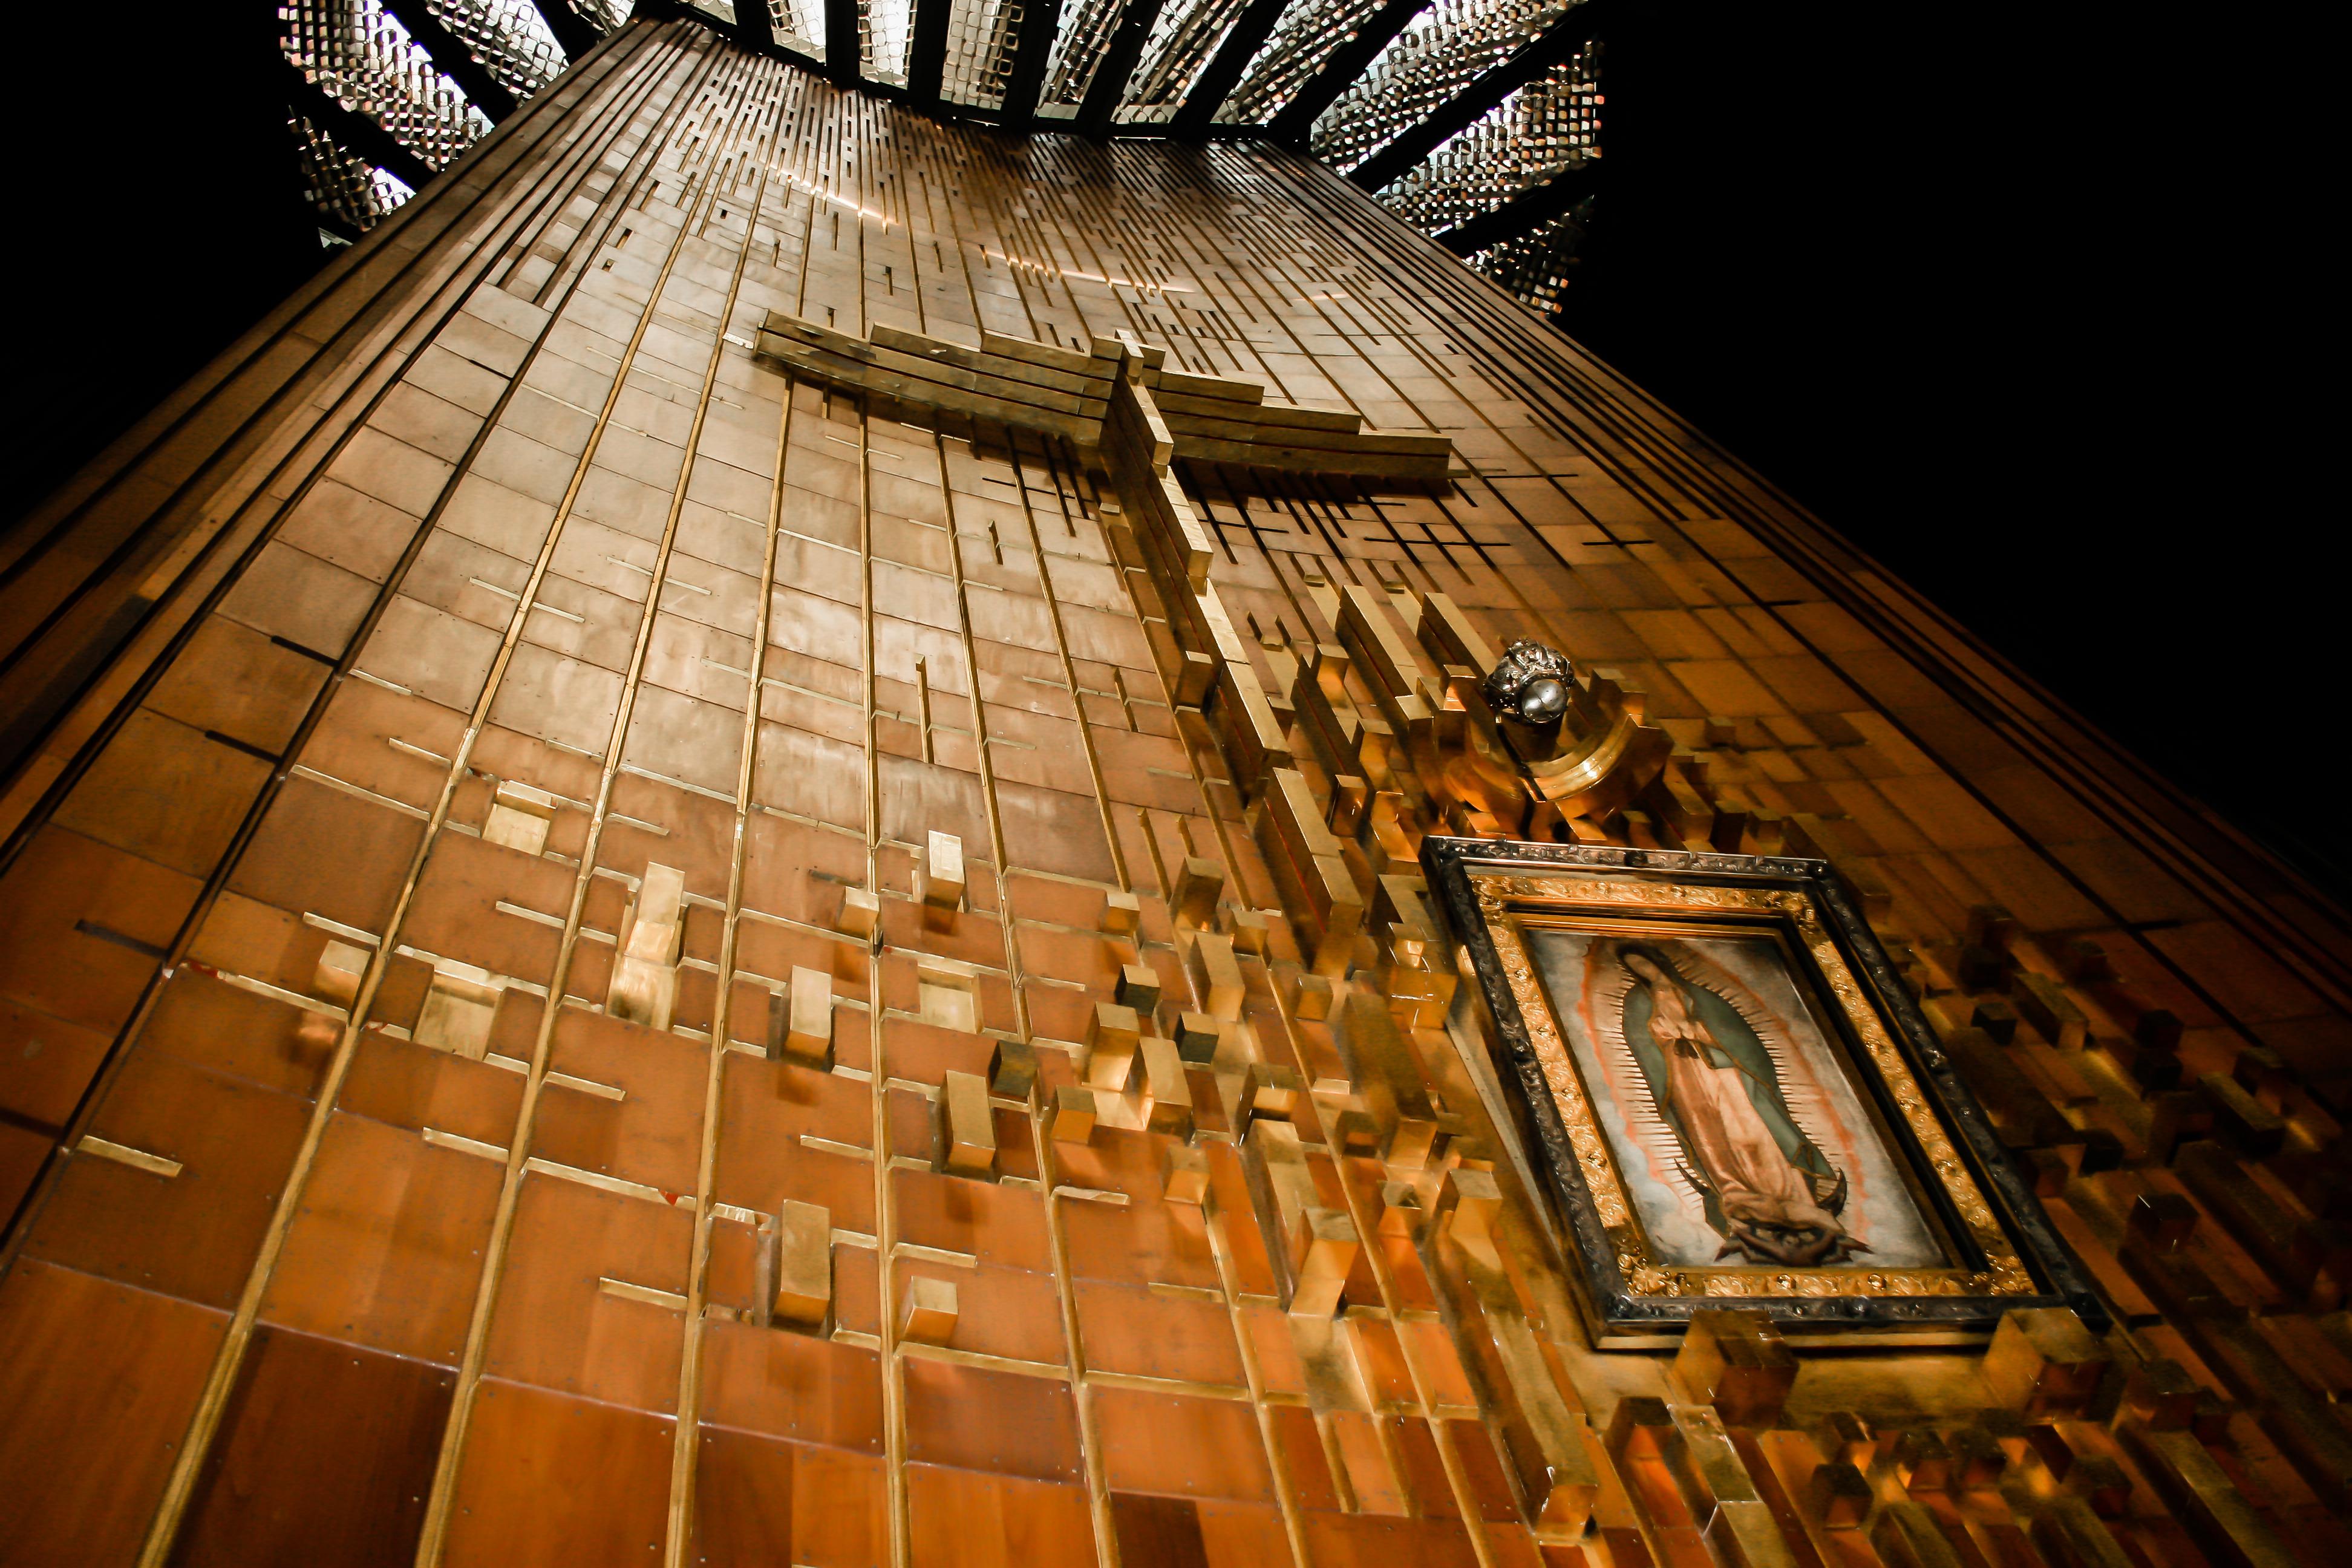 basilica_de_guadalupe_virgen_de_guadalup